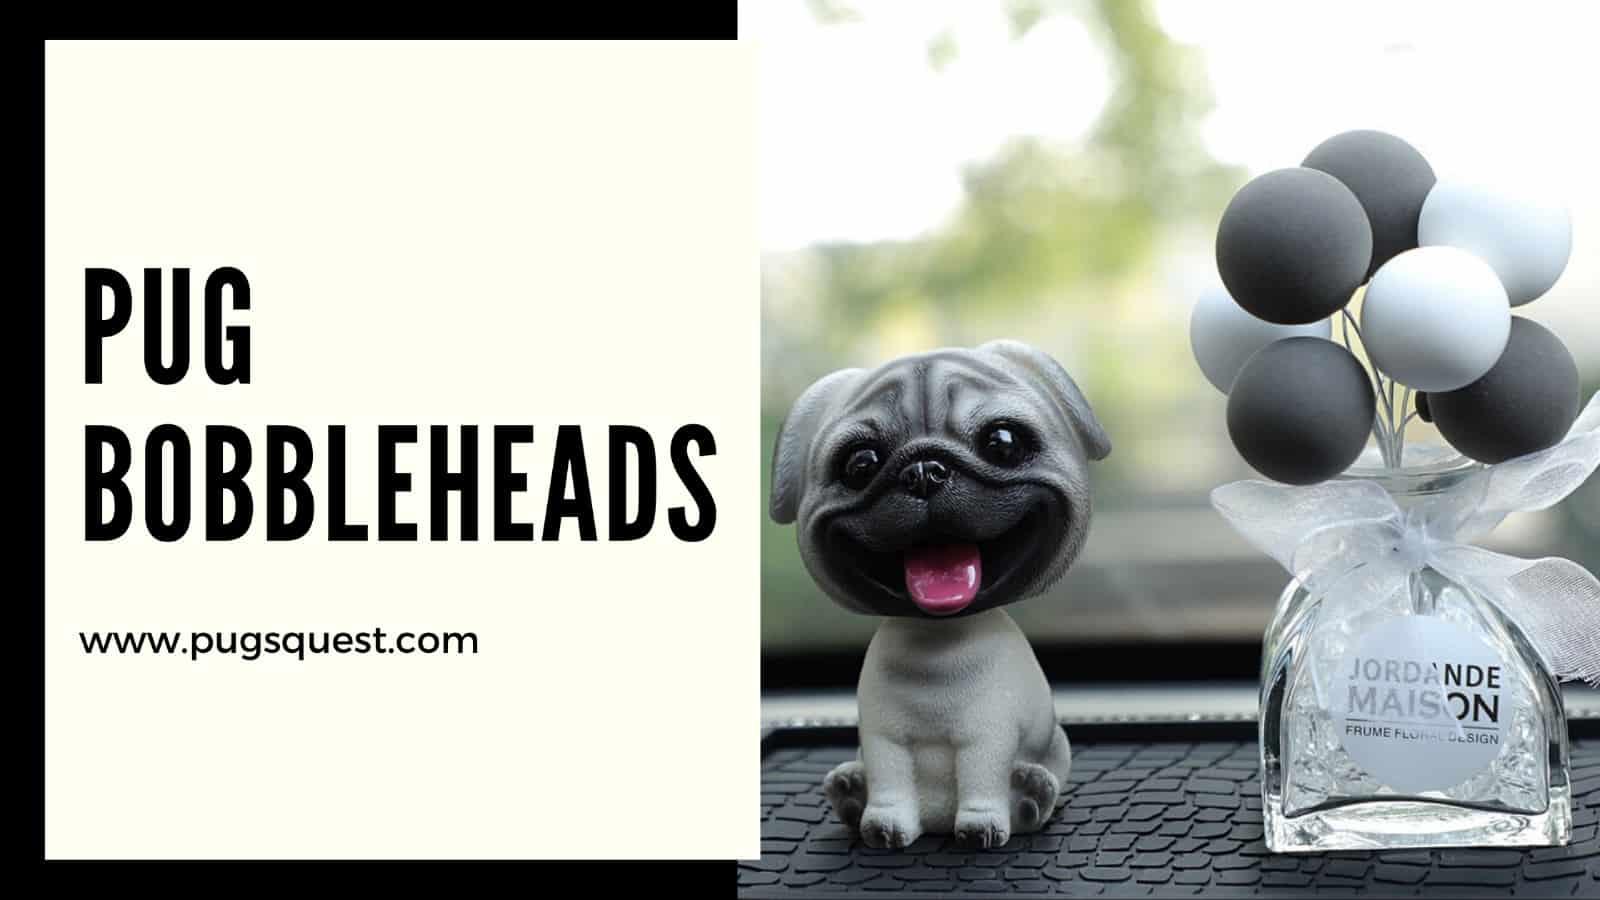 Pug BobbleHeads